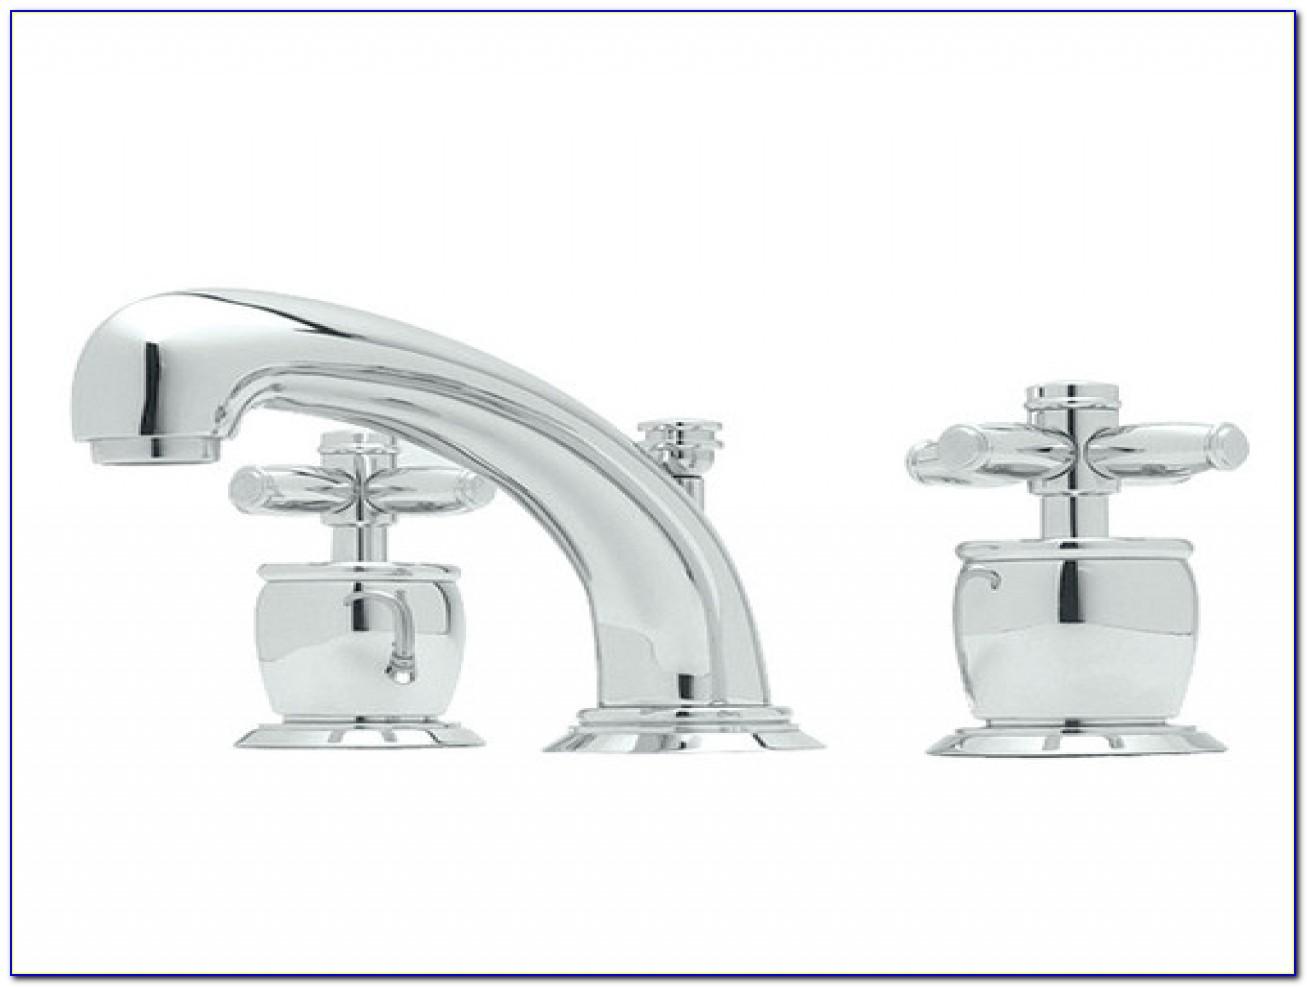 American Standard Faucet Handles Porcelain